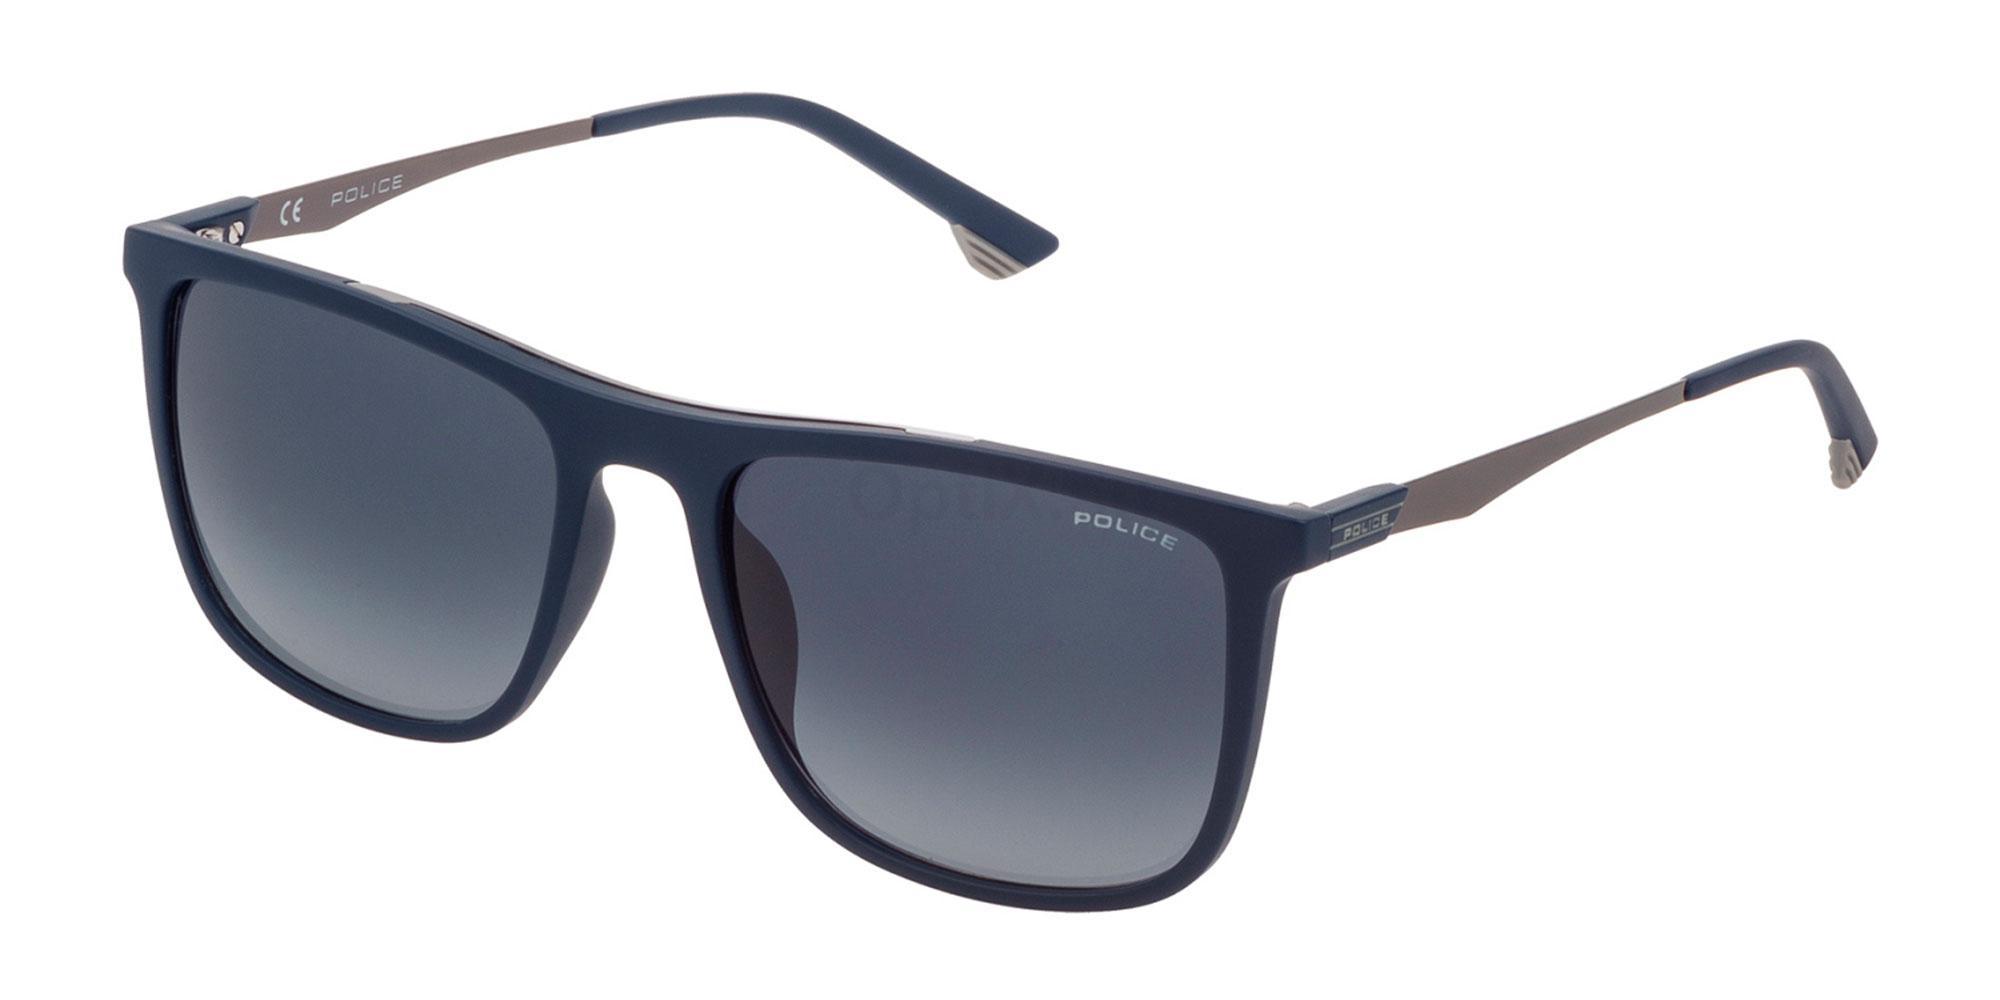 06QS SPL770 Sunglasses, Police